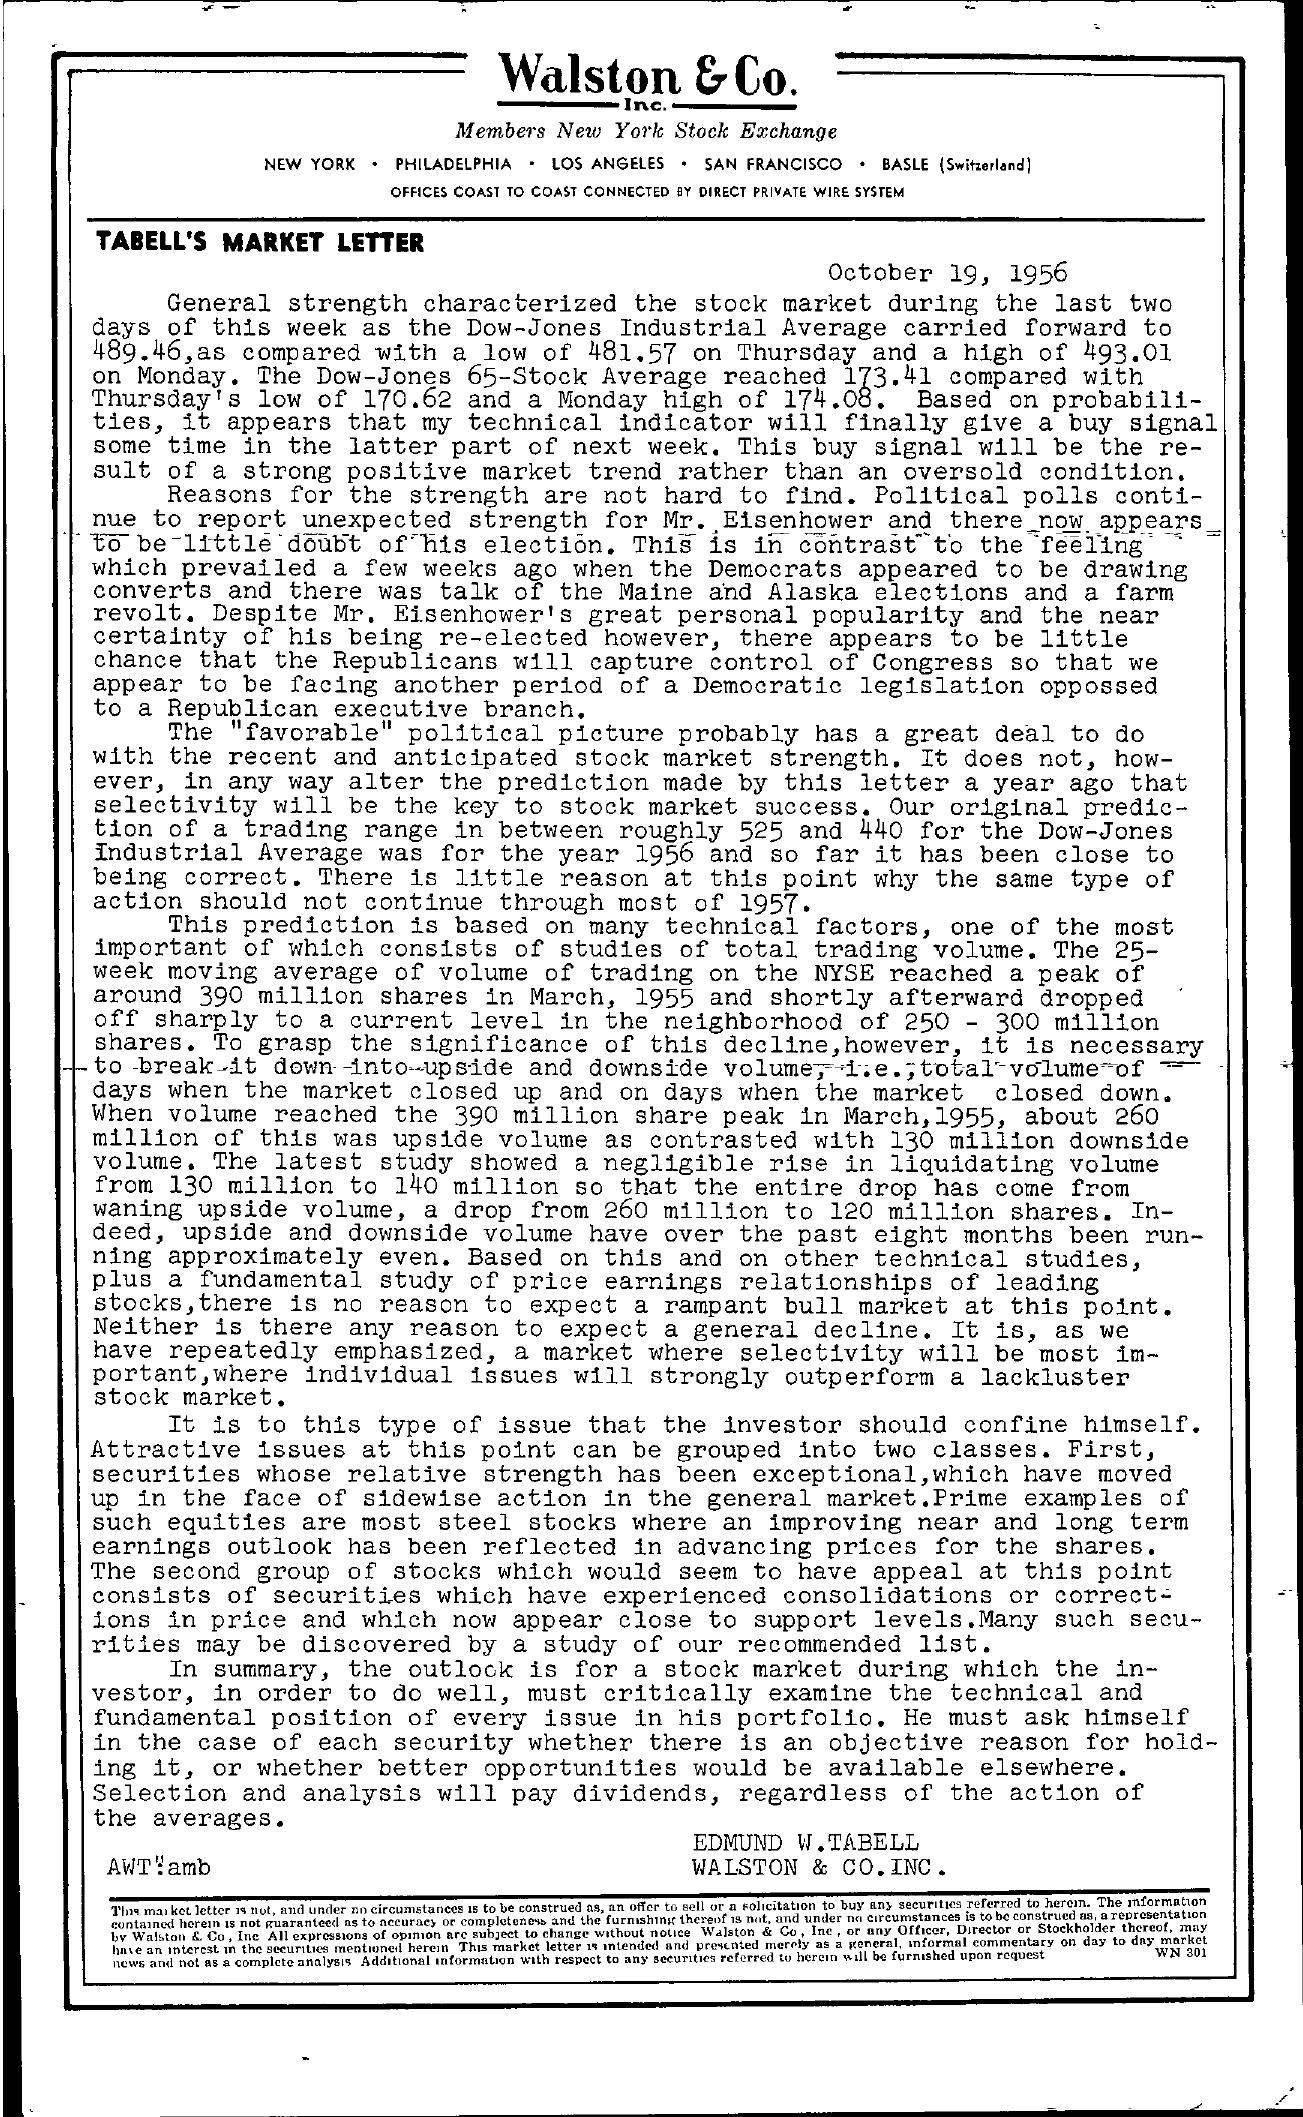 Tabell's Market Letter - October 19, 1956